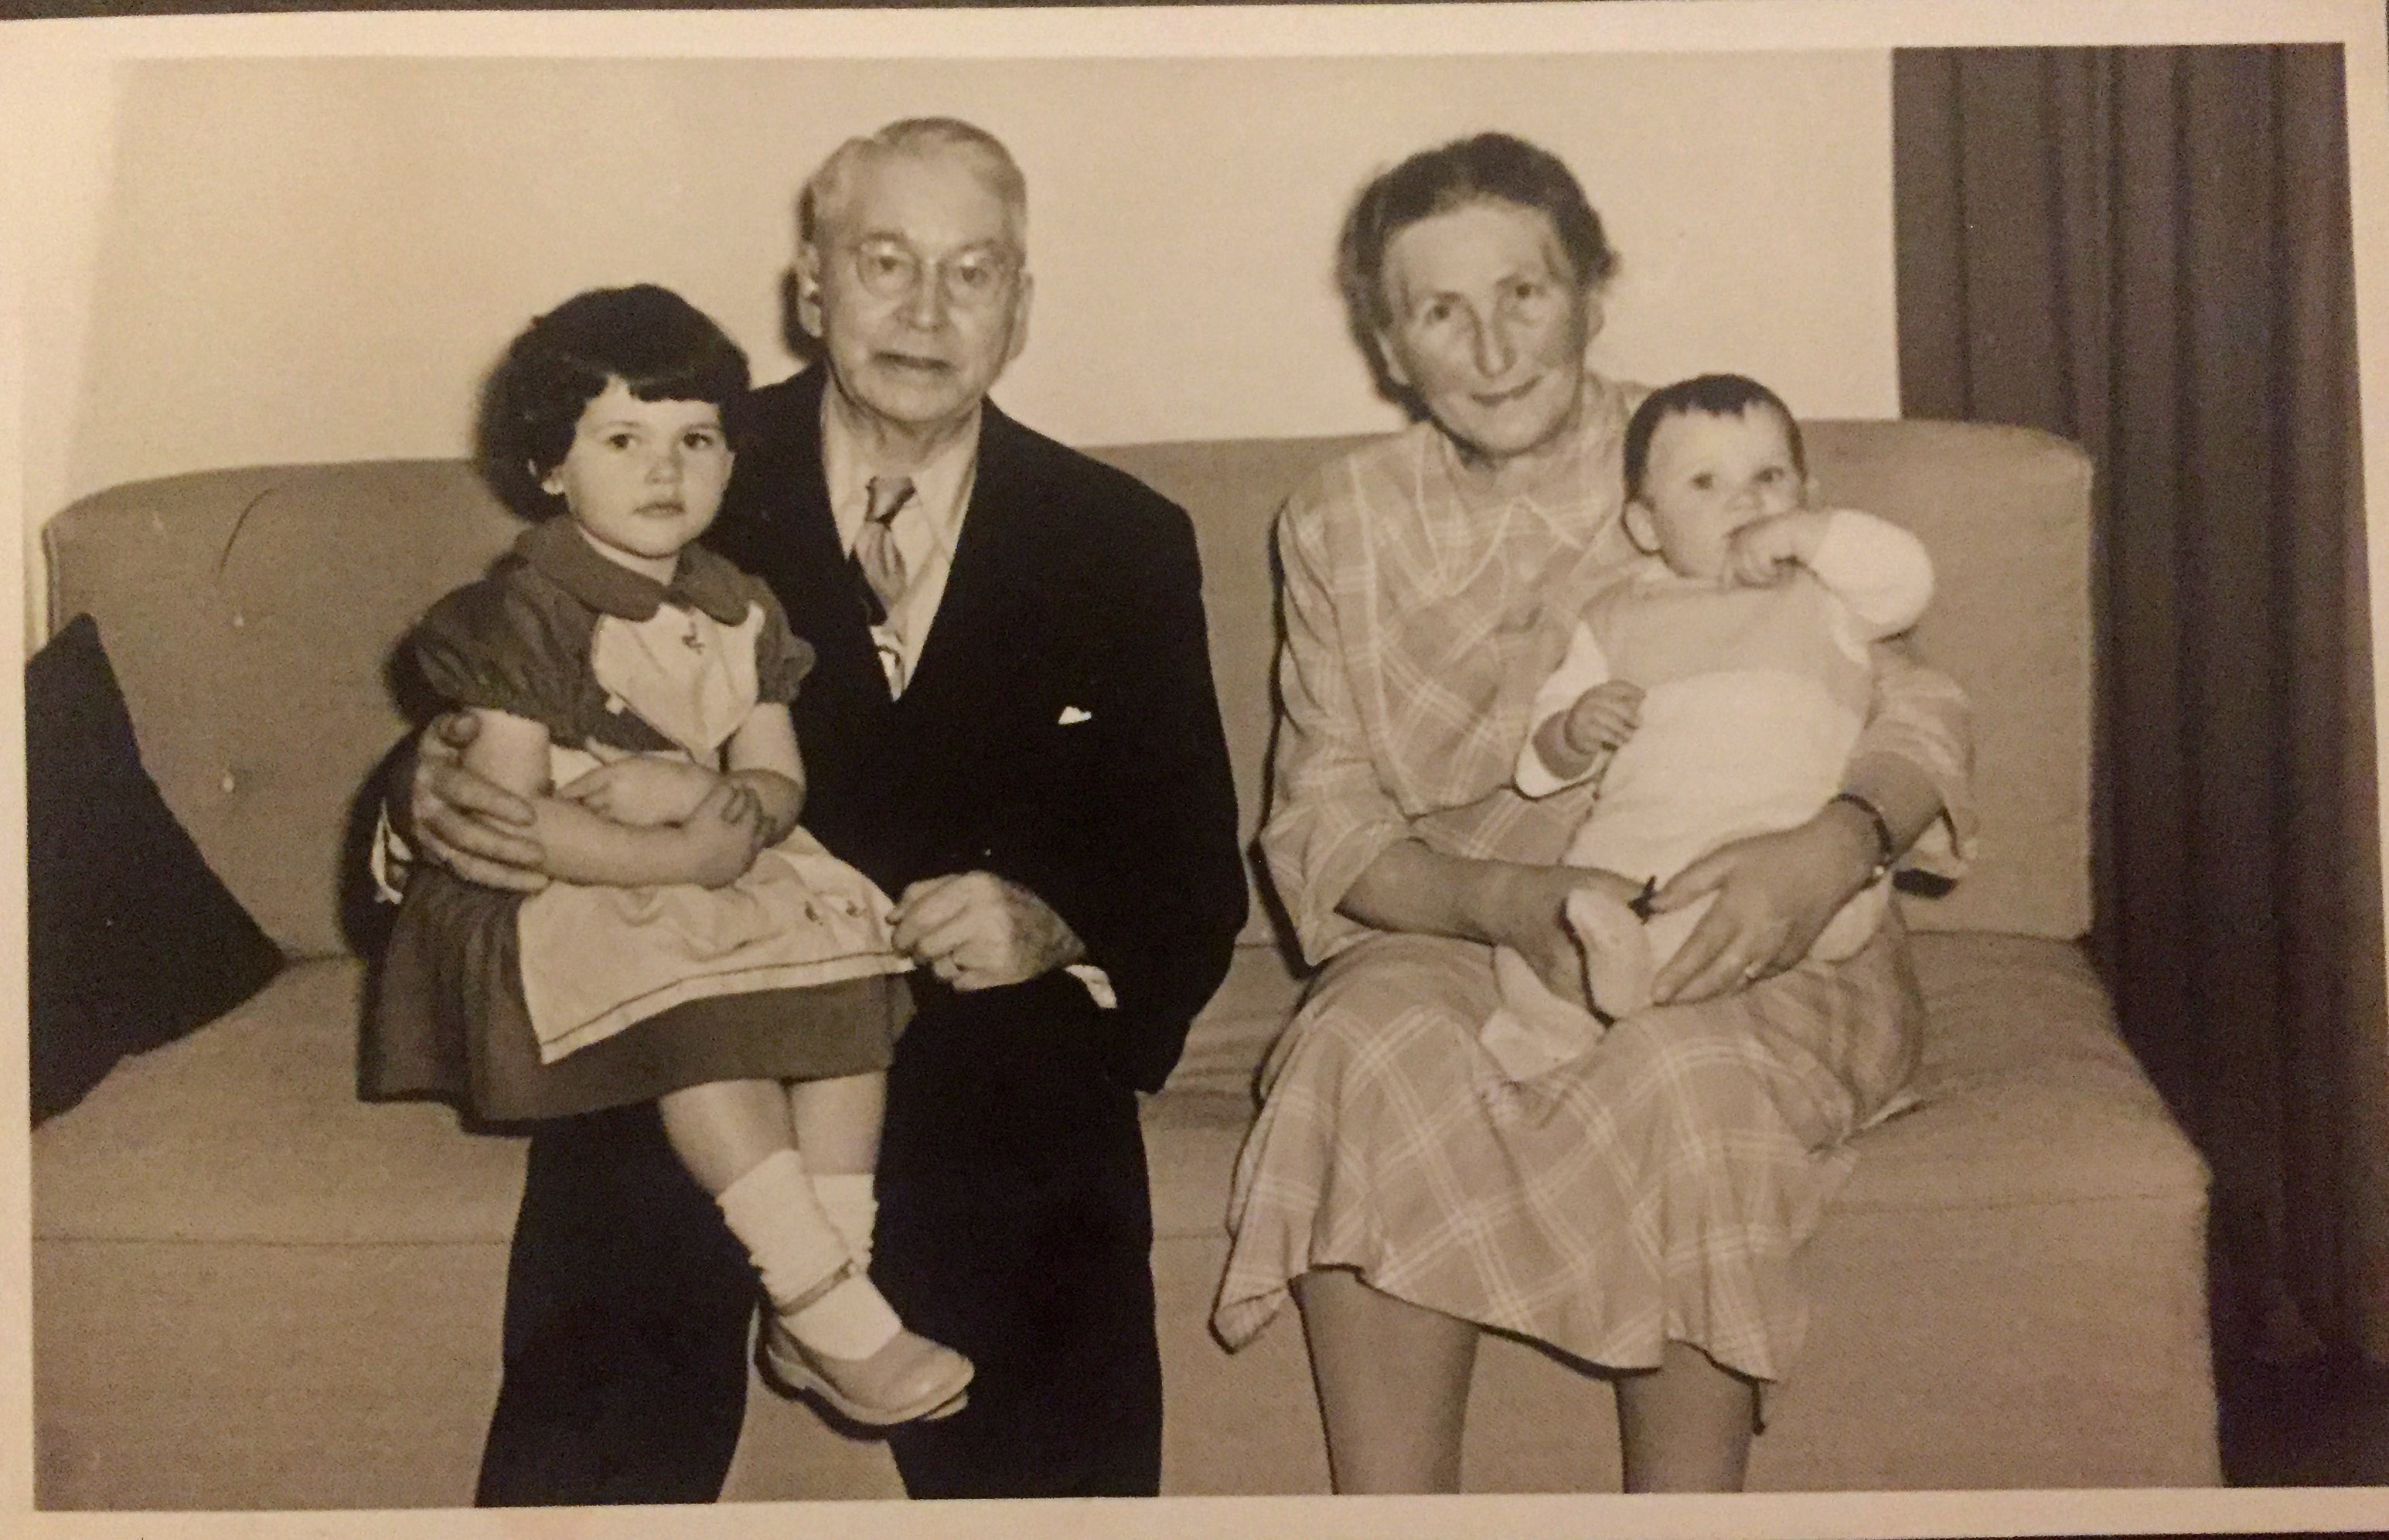 Min kusine og fætter hos deres farfar Emry og farmor Asta